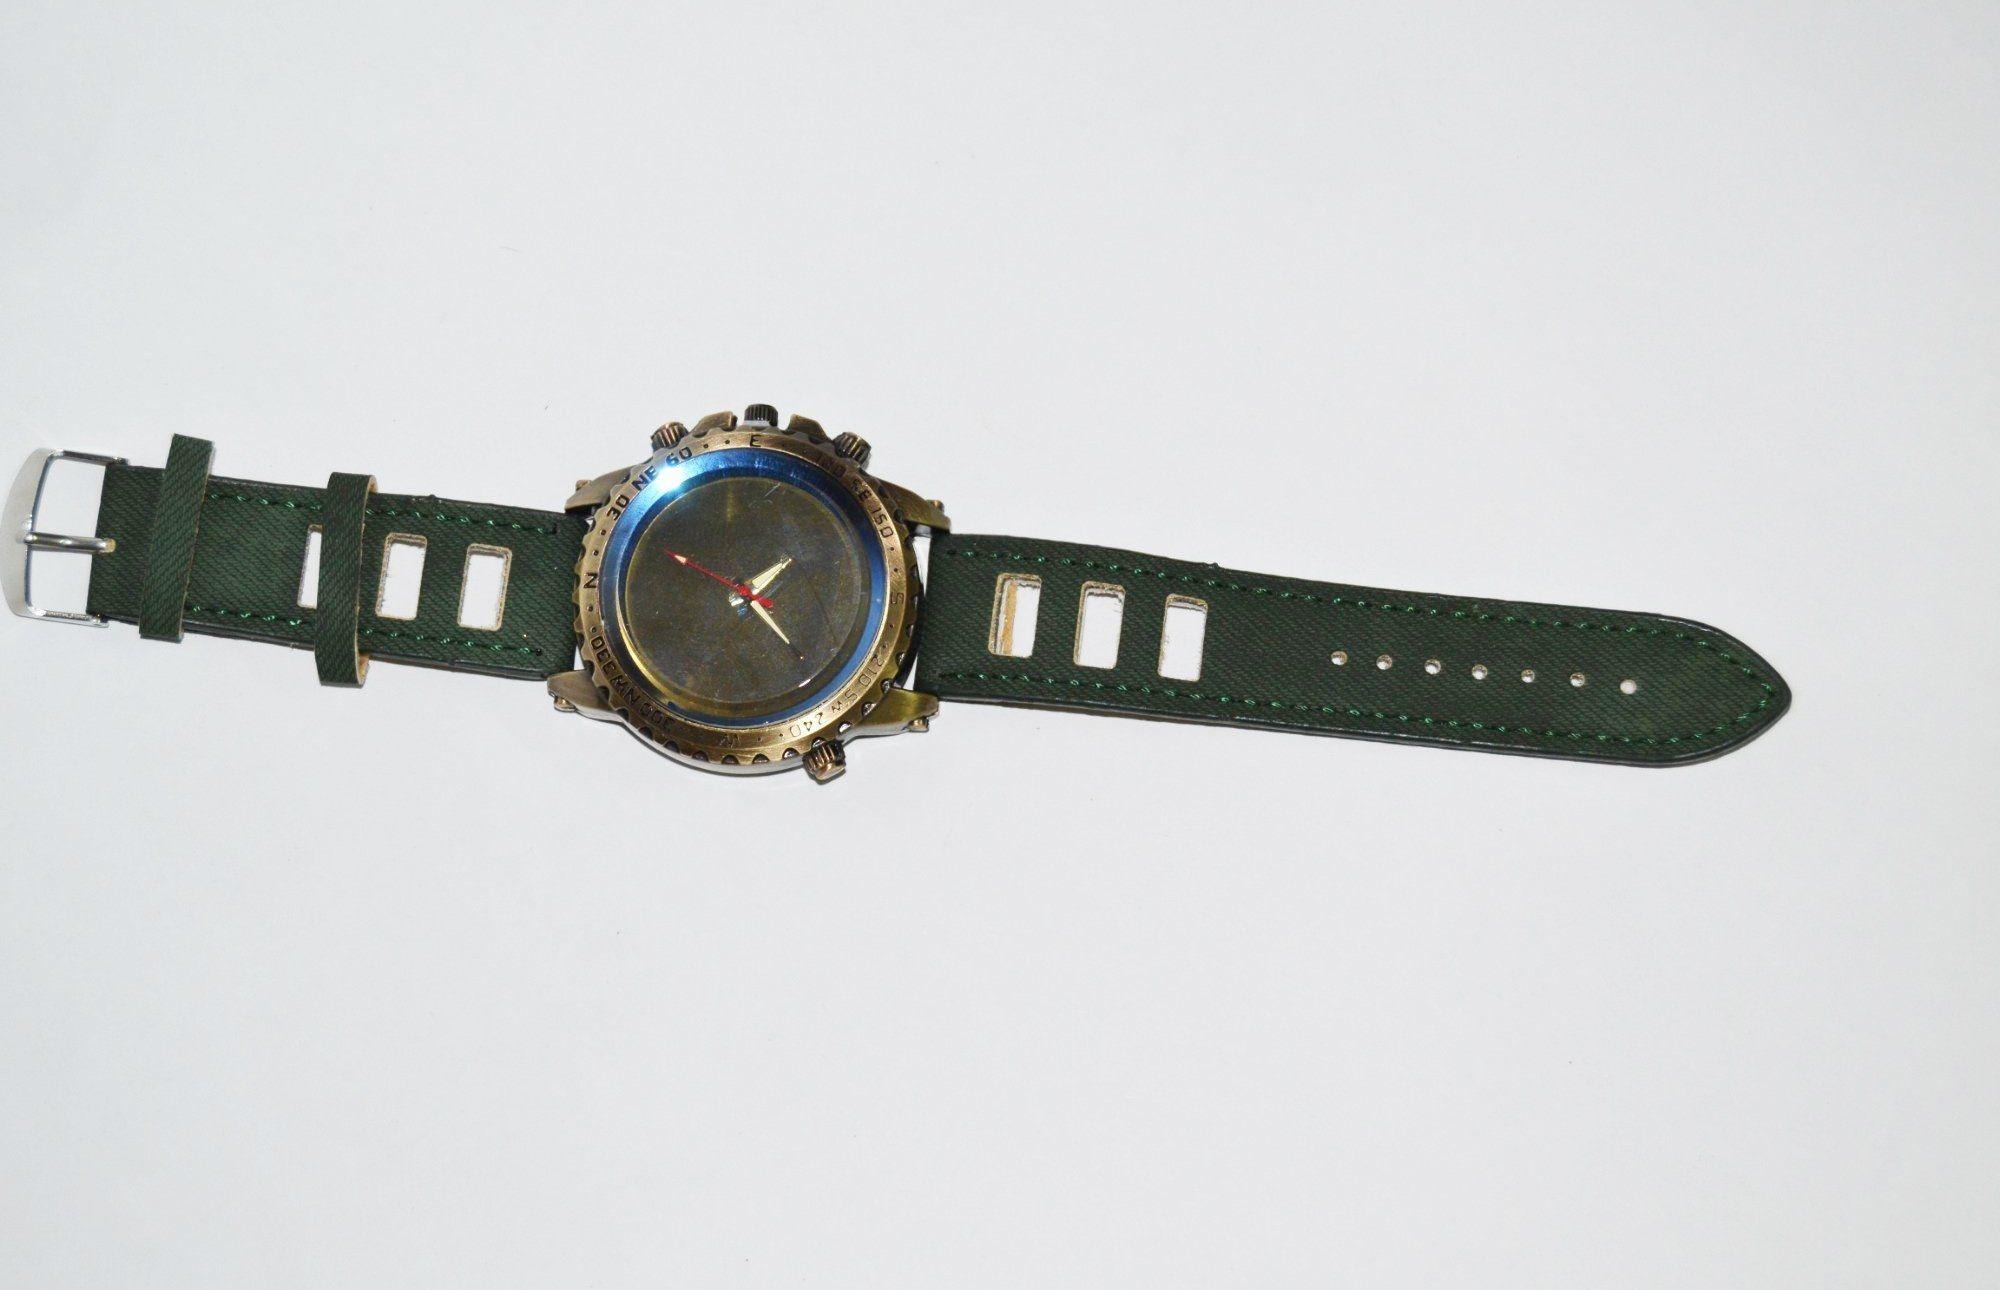 5f6eb9807 سعر Leather Vintage Watch ساعة حريمي جلد برتقالى فى مصر | سوق ...